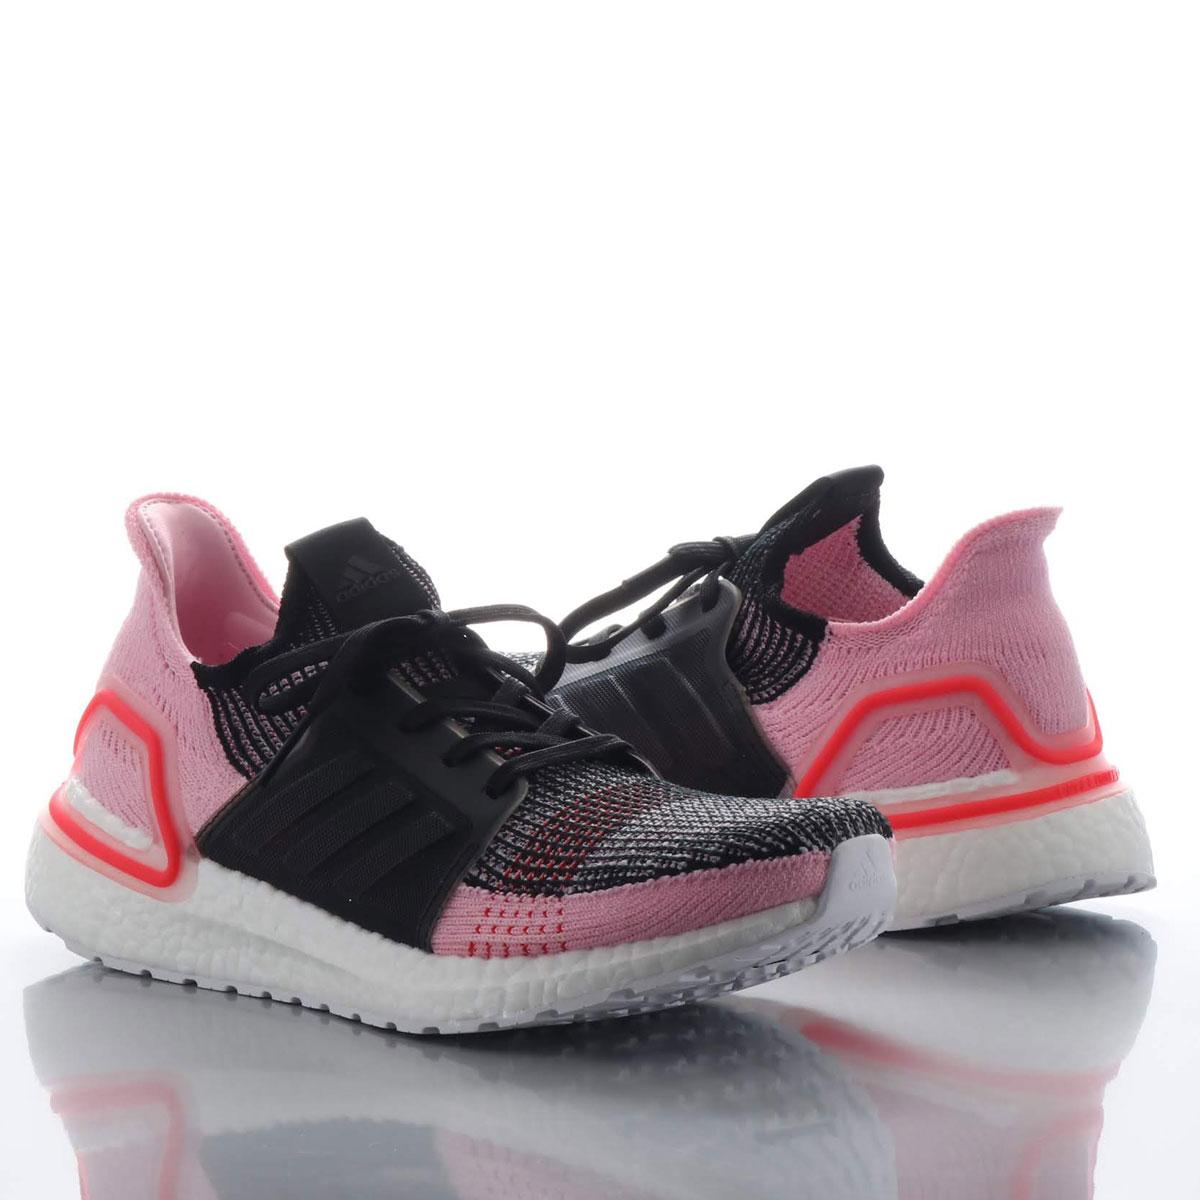 adidas UltraBOOST 19 w(アディダス ウルトラブースト 19 w)CORE BLACK/ORCHID TINT/ACTIVE RED【メンズ レディース スニーカー】19SS-I